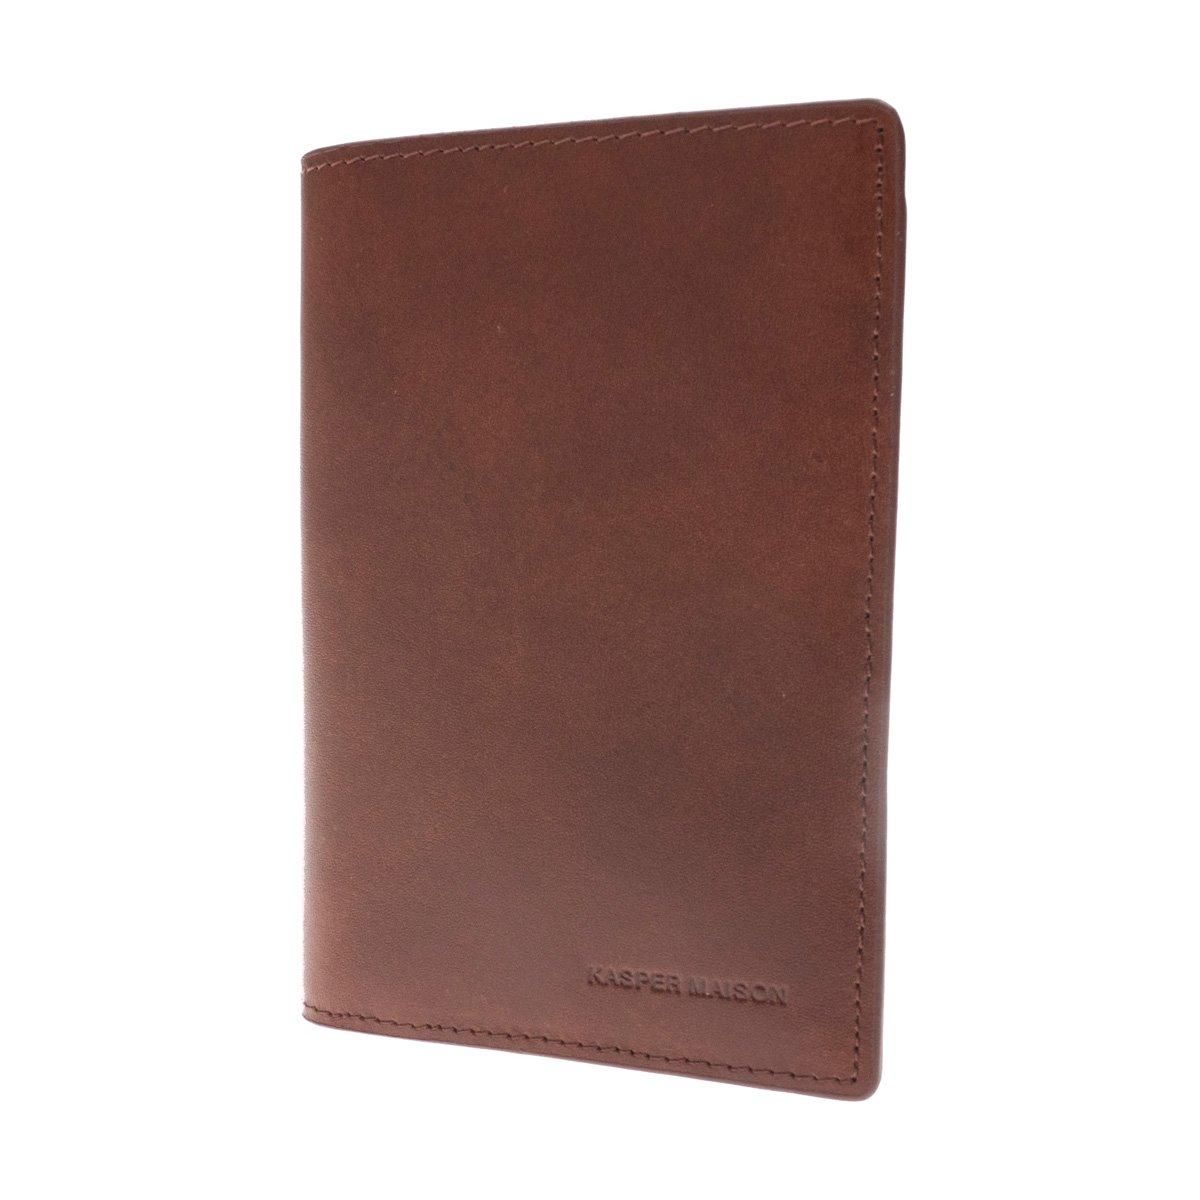 Kasper Maison Italian Leather Passport Holder – Travel Document Case with anti theft RFID Blocking – Signature Gift included